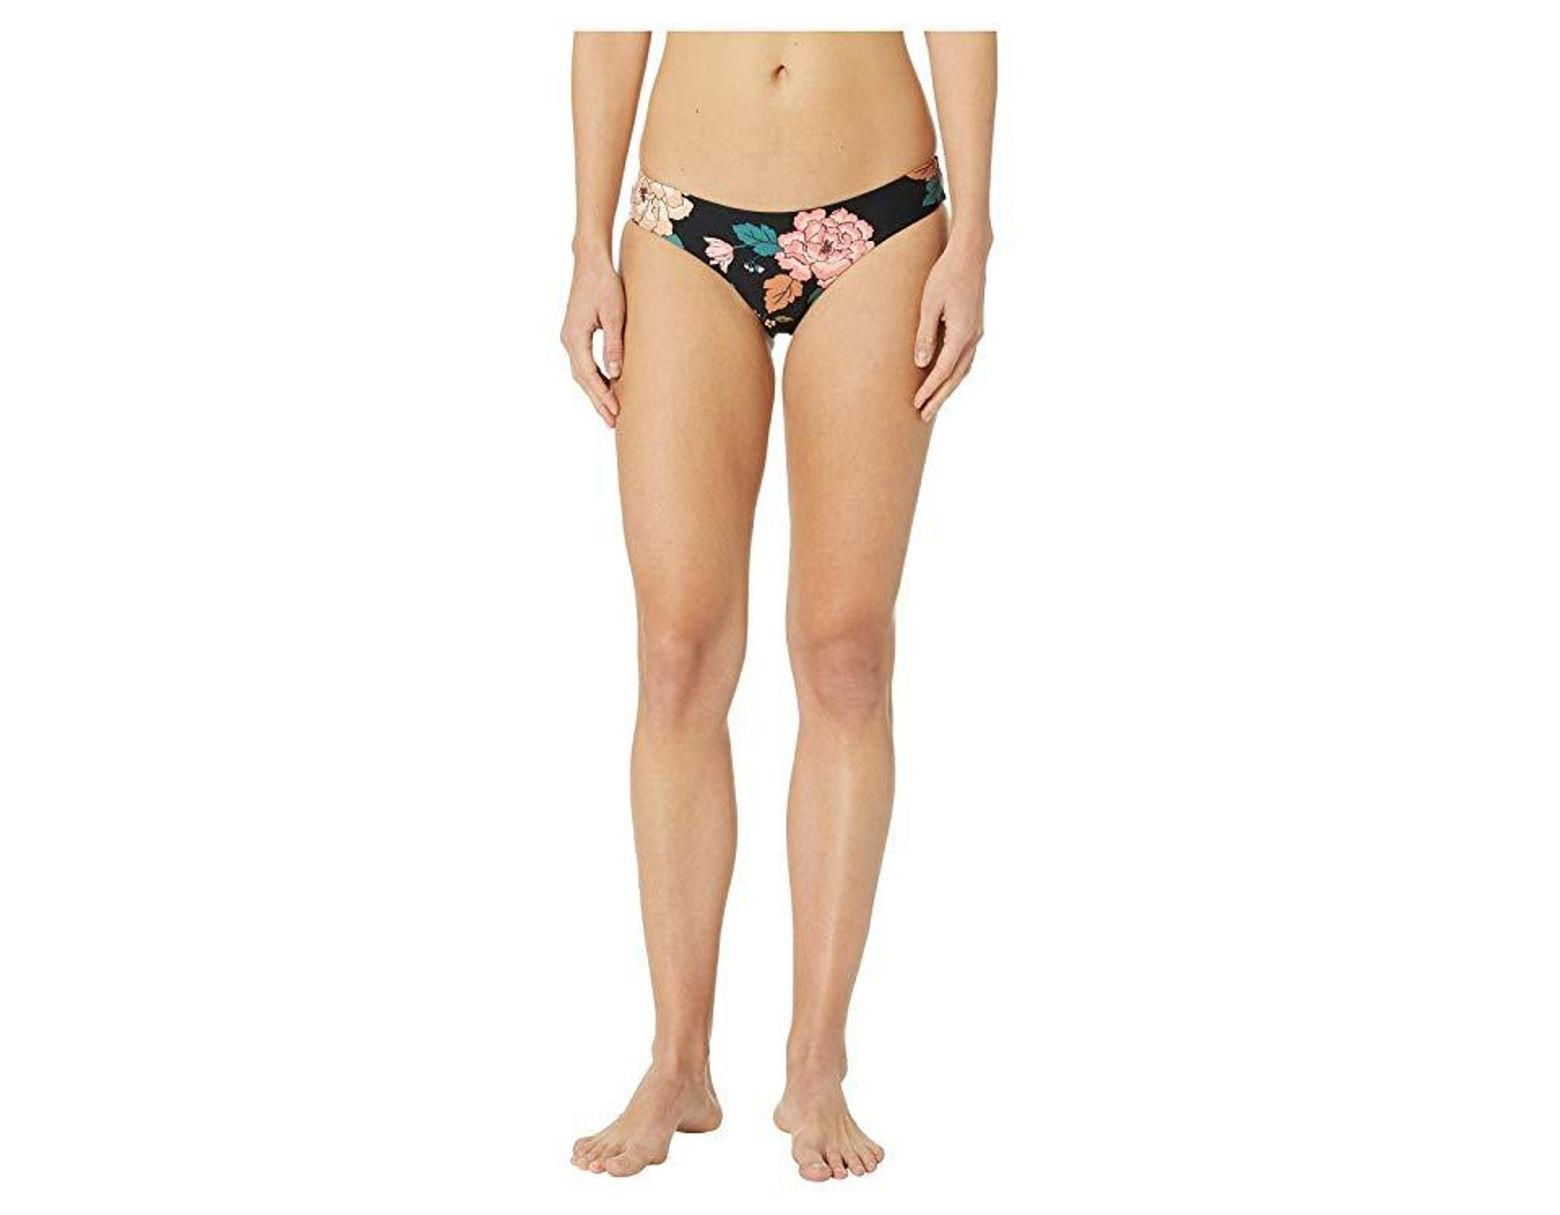 fff0357d7b4 Billabong Linger On Hawaii Lo Bottoms (black Pebble) Swimwear in Black -  Save 23% - Lyst